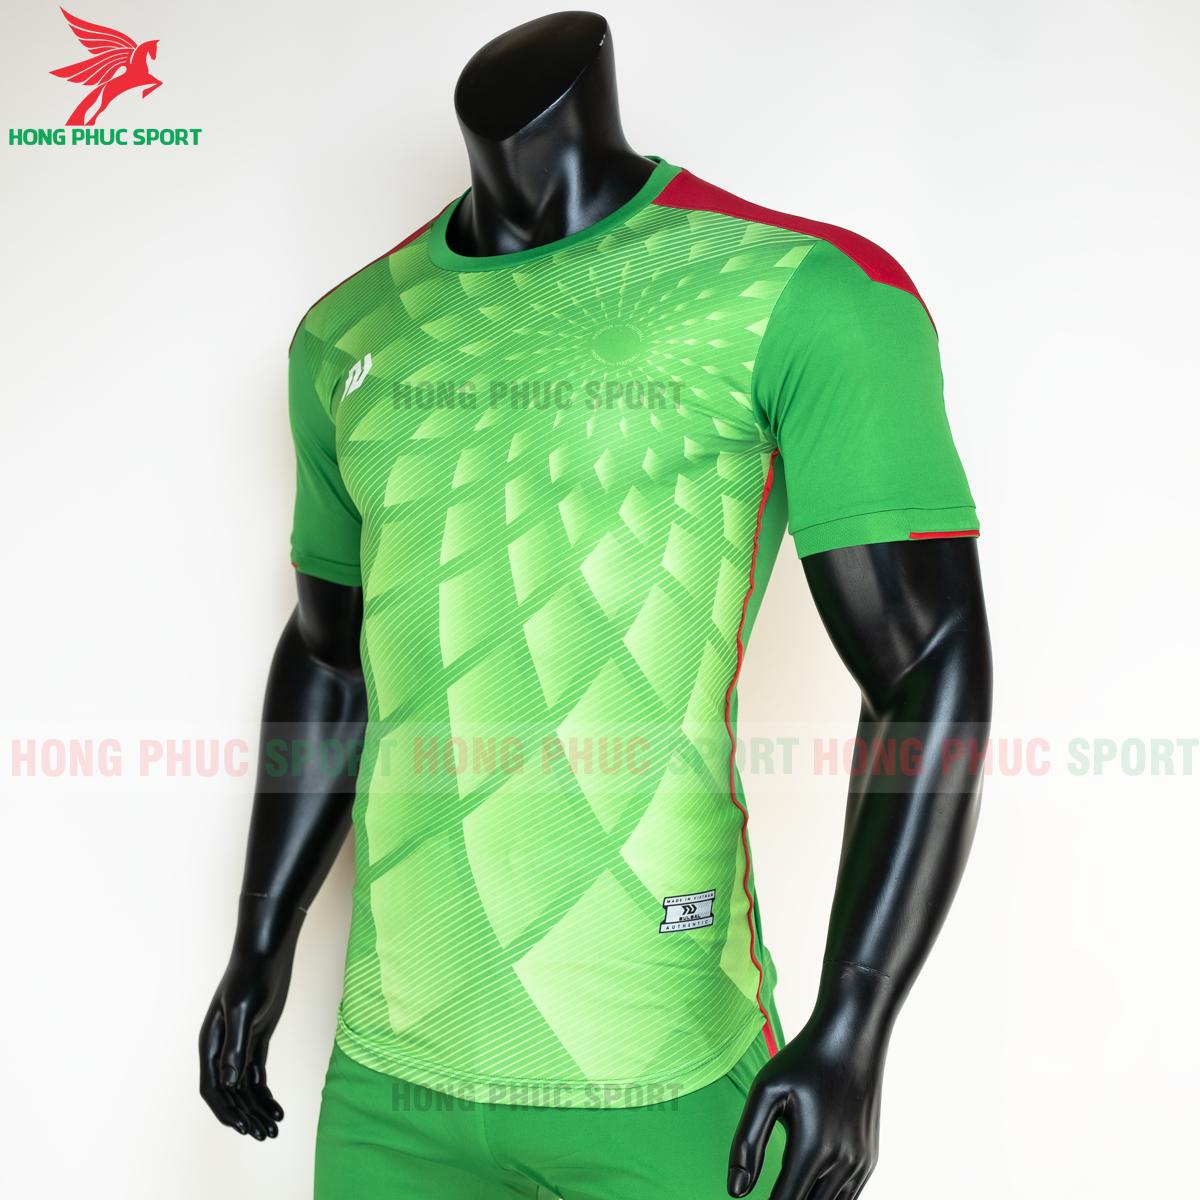 https://cdn.hongphucsport.com/unsafe/s4.shopbay.vn/files/285/ao-bong-da-khong-logo-bulbal-lotus-mau-xanh-la-3-6050114a26ef9.png